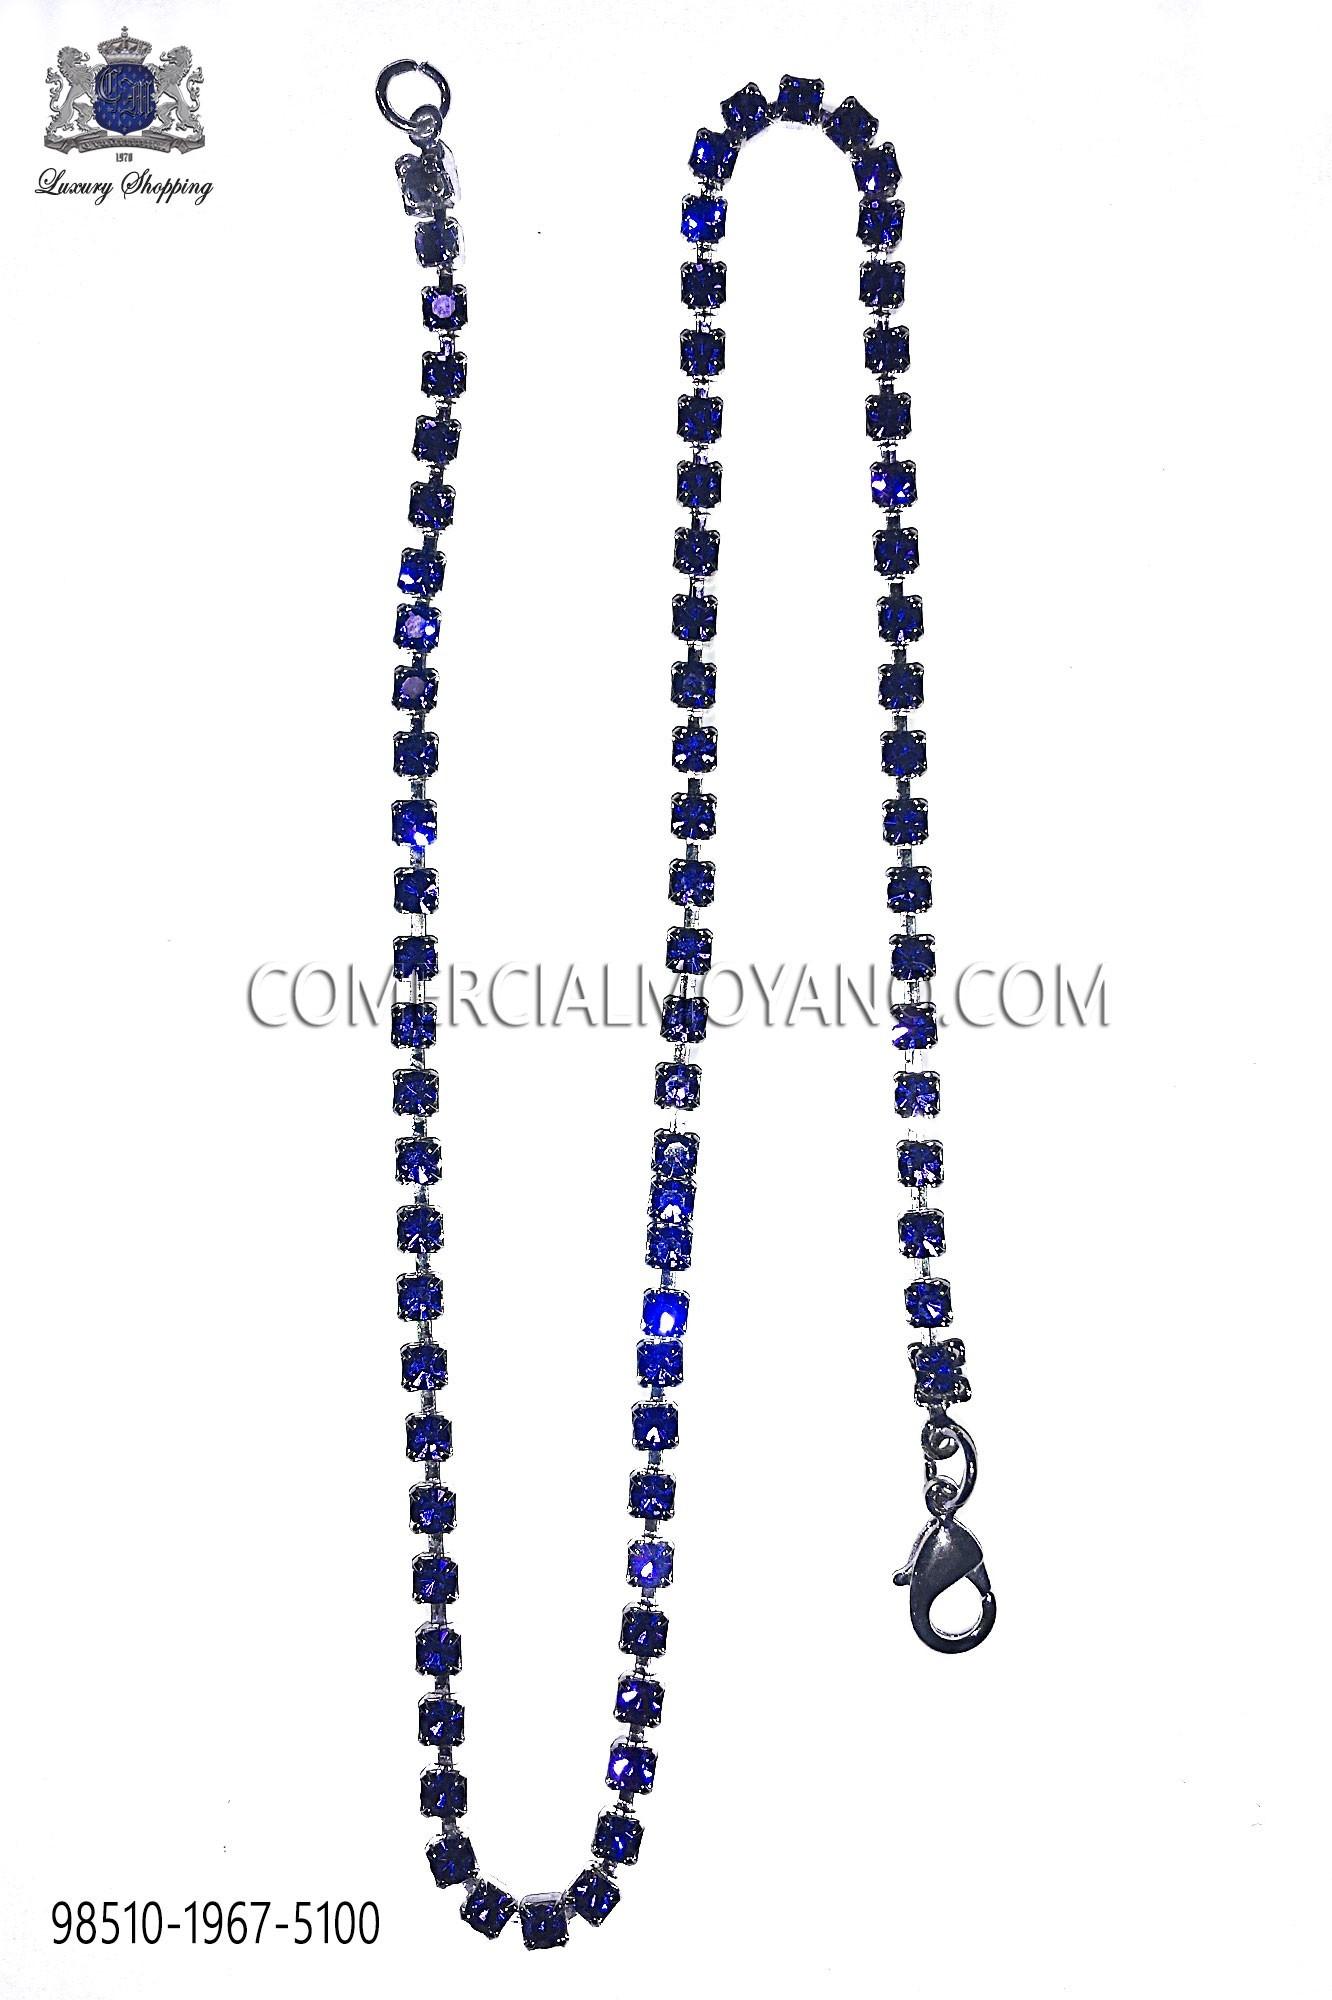 Nickel tone chain with blue sapphire rhinestones Ottavio Nuccio Gala.